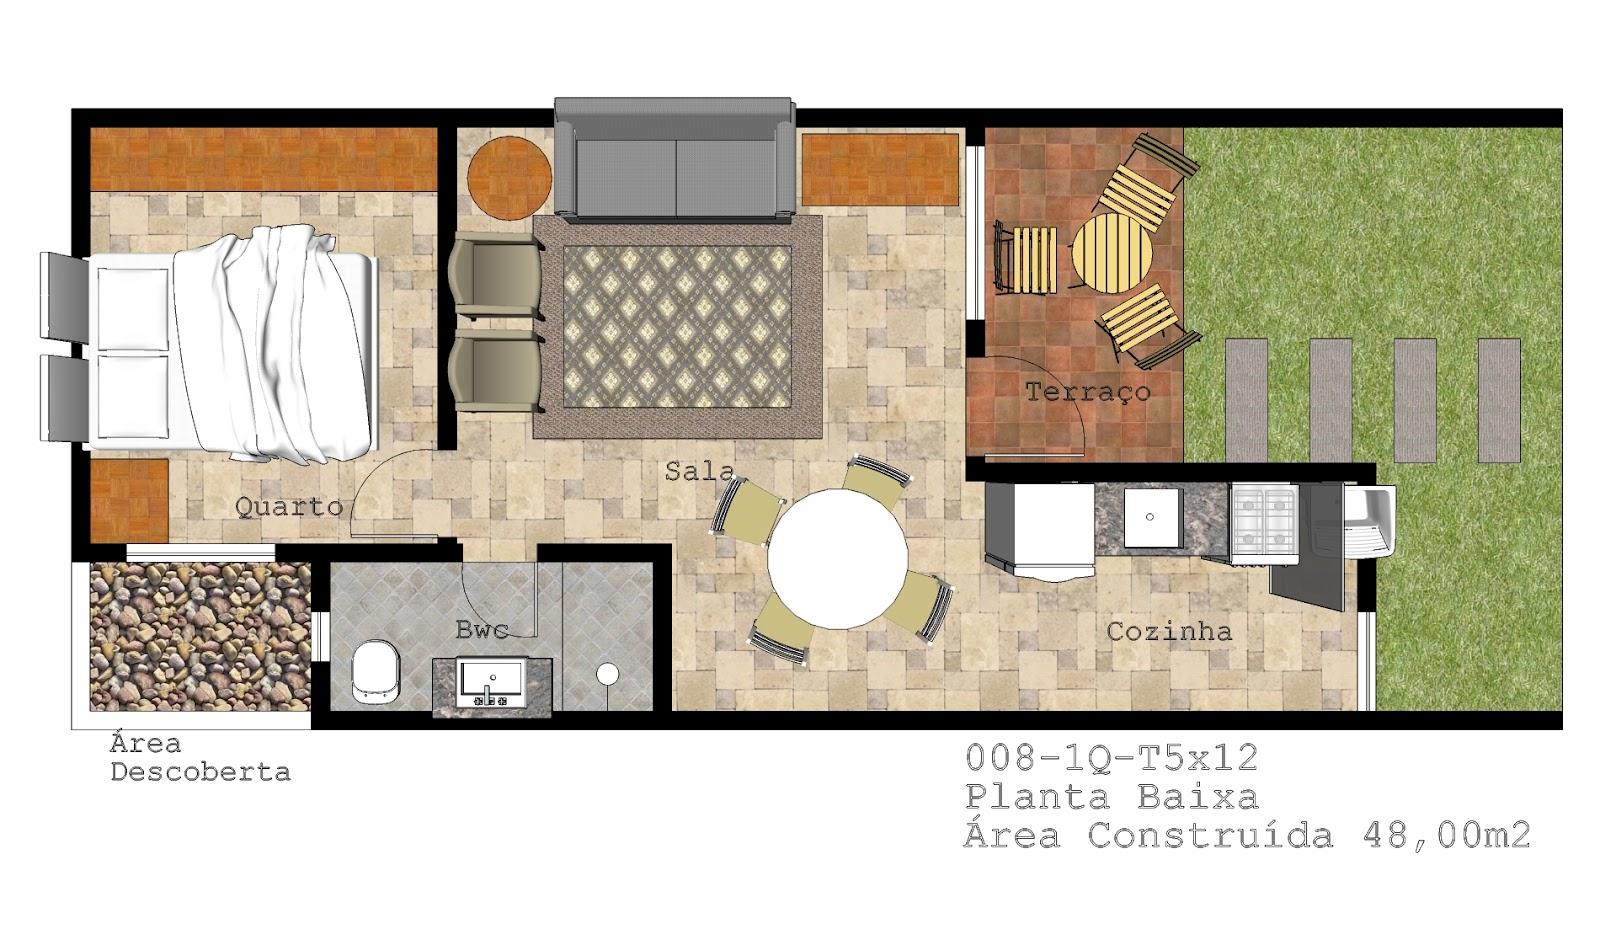 modelos de plantas de casas com edícula #9F622C 1600 945